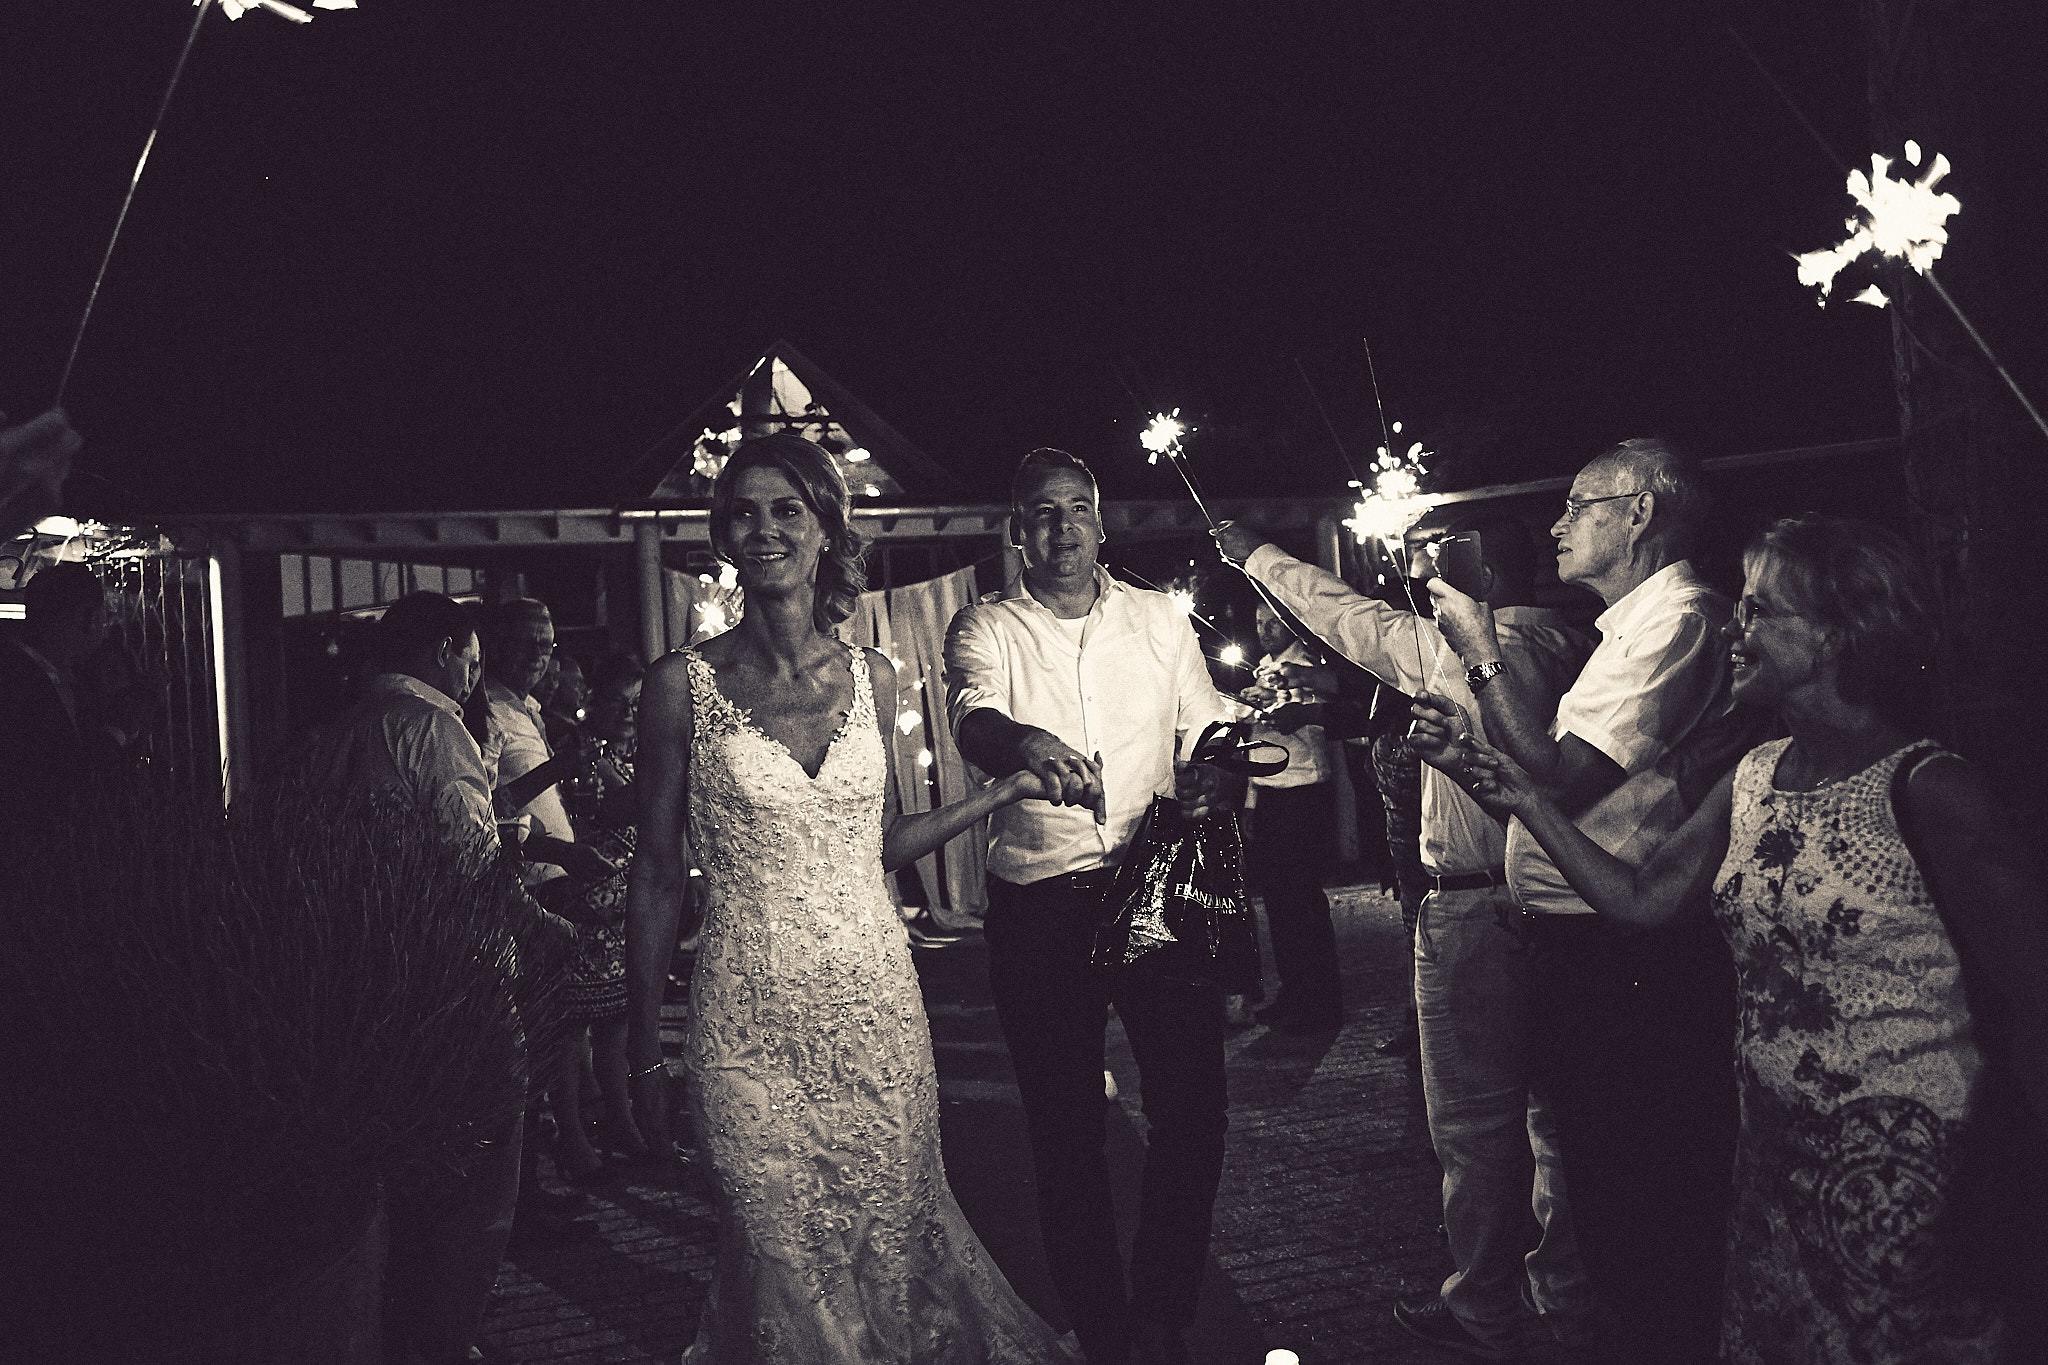 bruidsfotografie-trouwreportage-Delft-Ingrid-Richard_1455.jpg